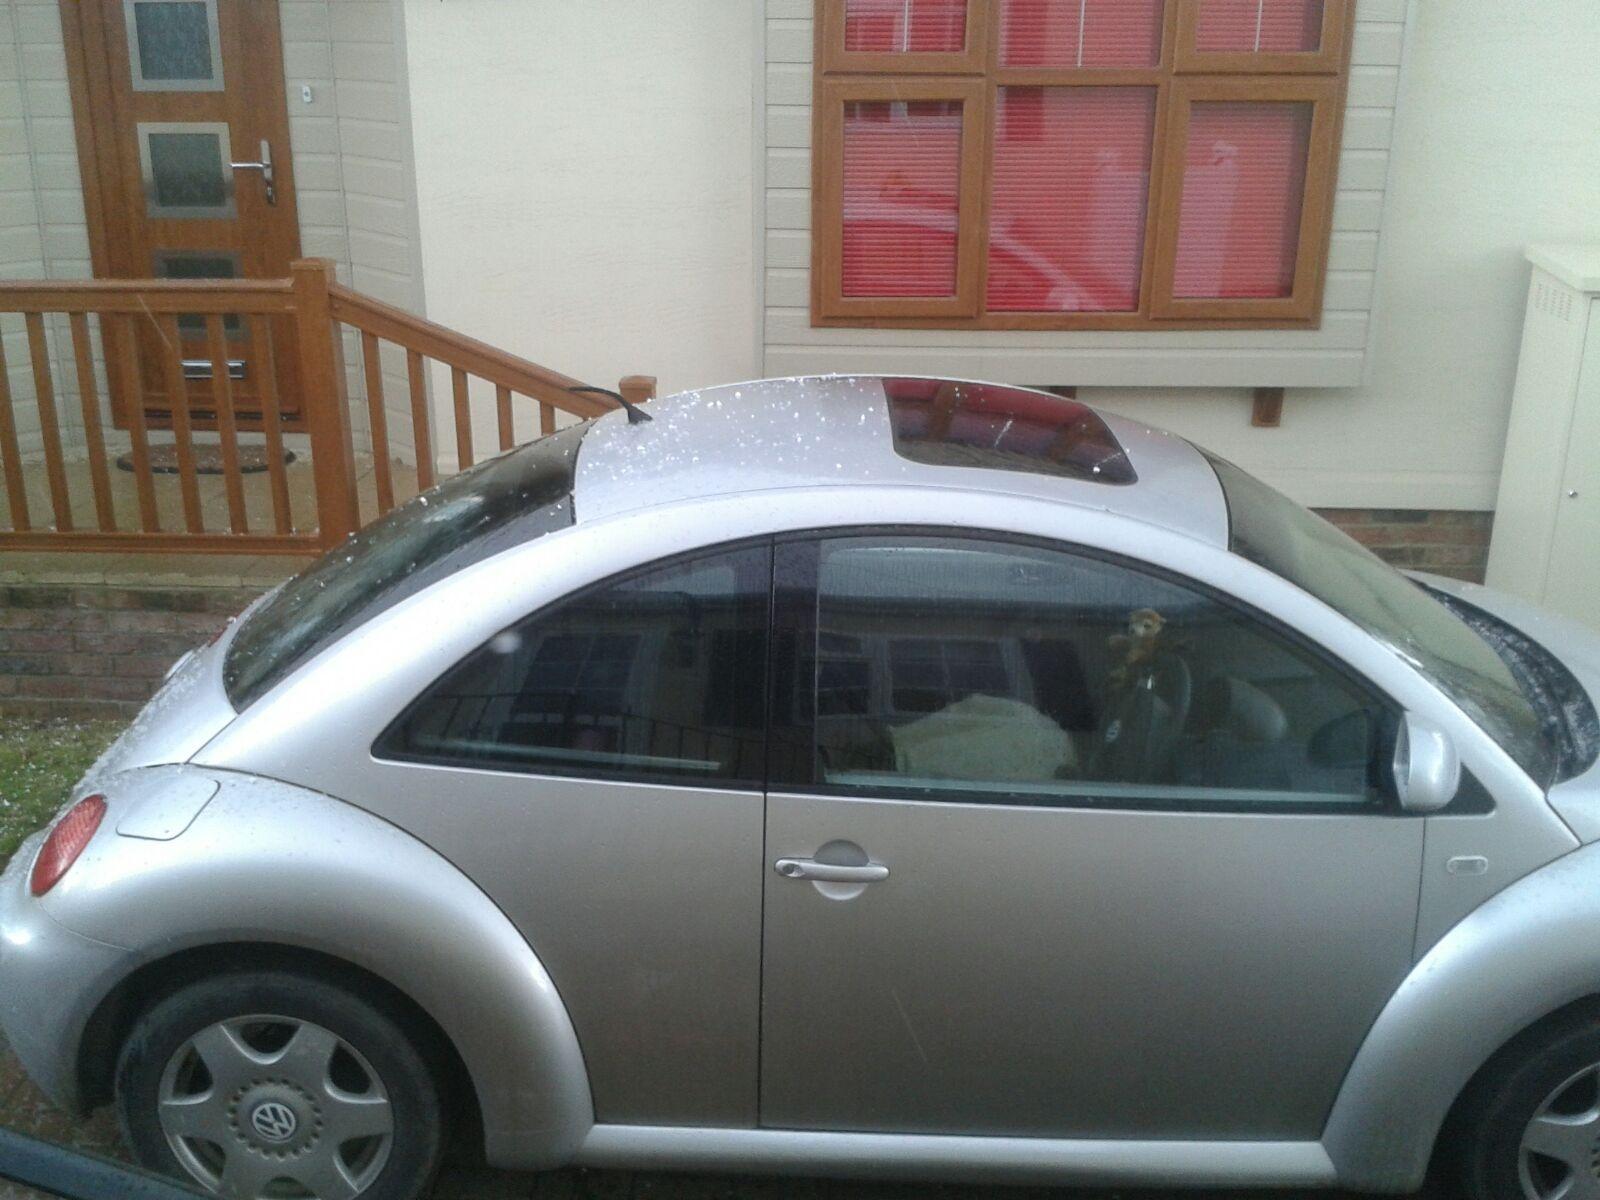 Volkswagen Beetle Questions - Rear End Knock